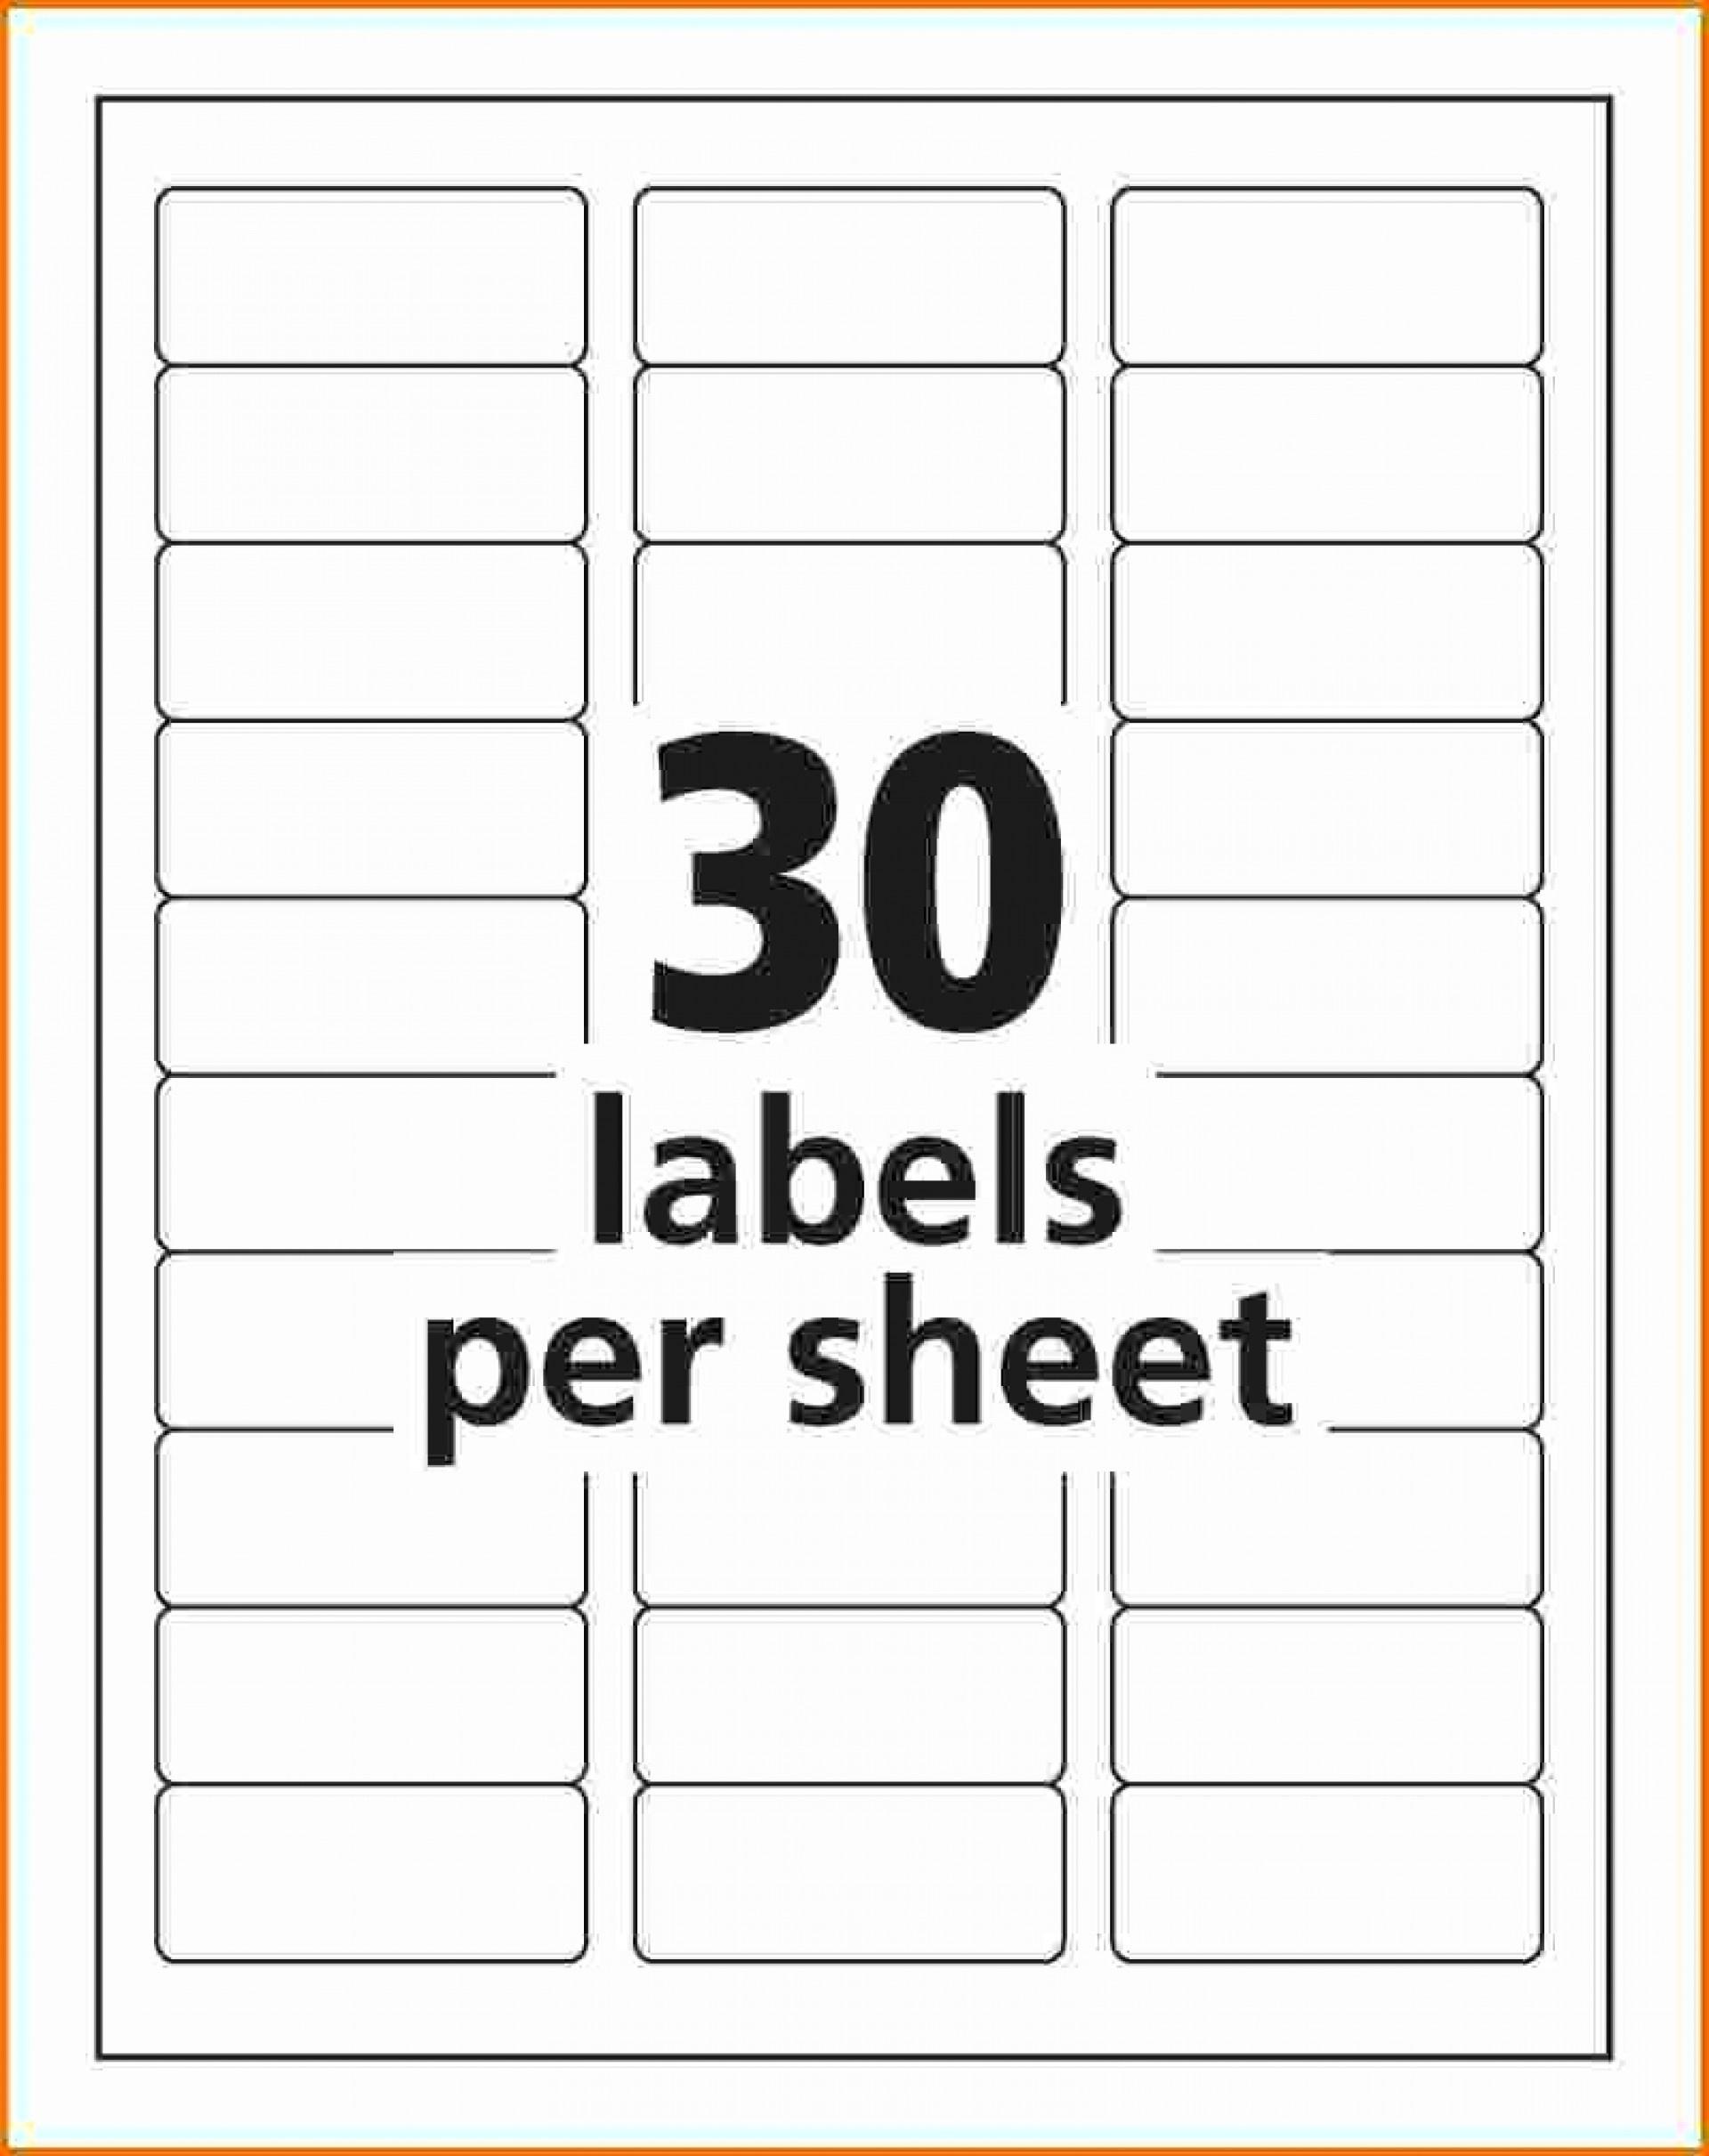 002 Template Ideas Free Printable Address Label Templates Imposing - Free Printable Label Templates For Word